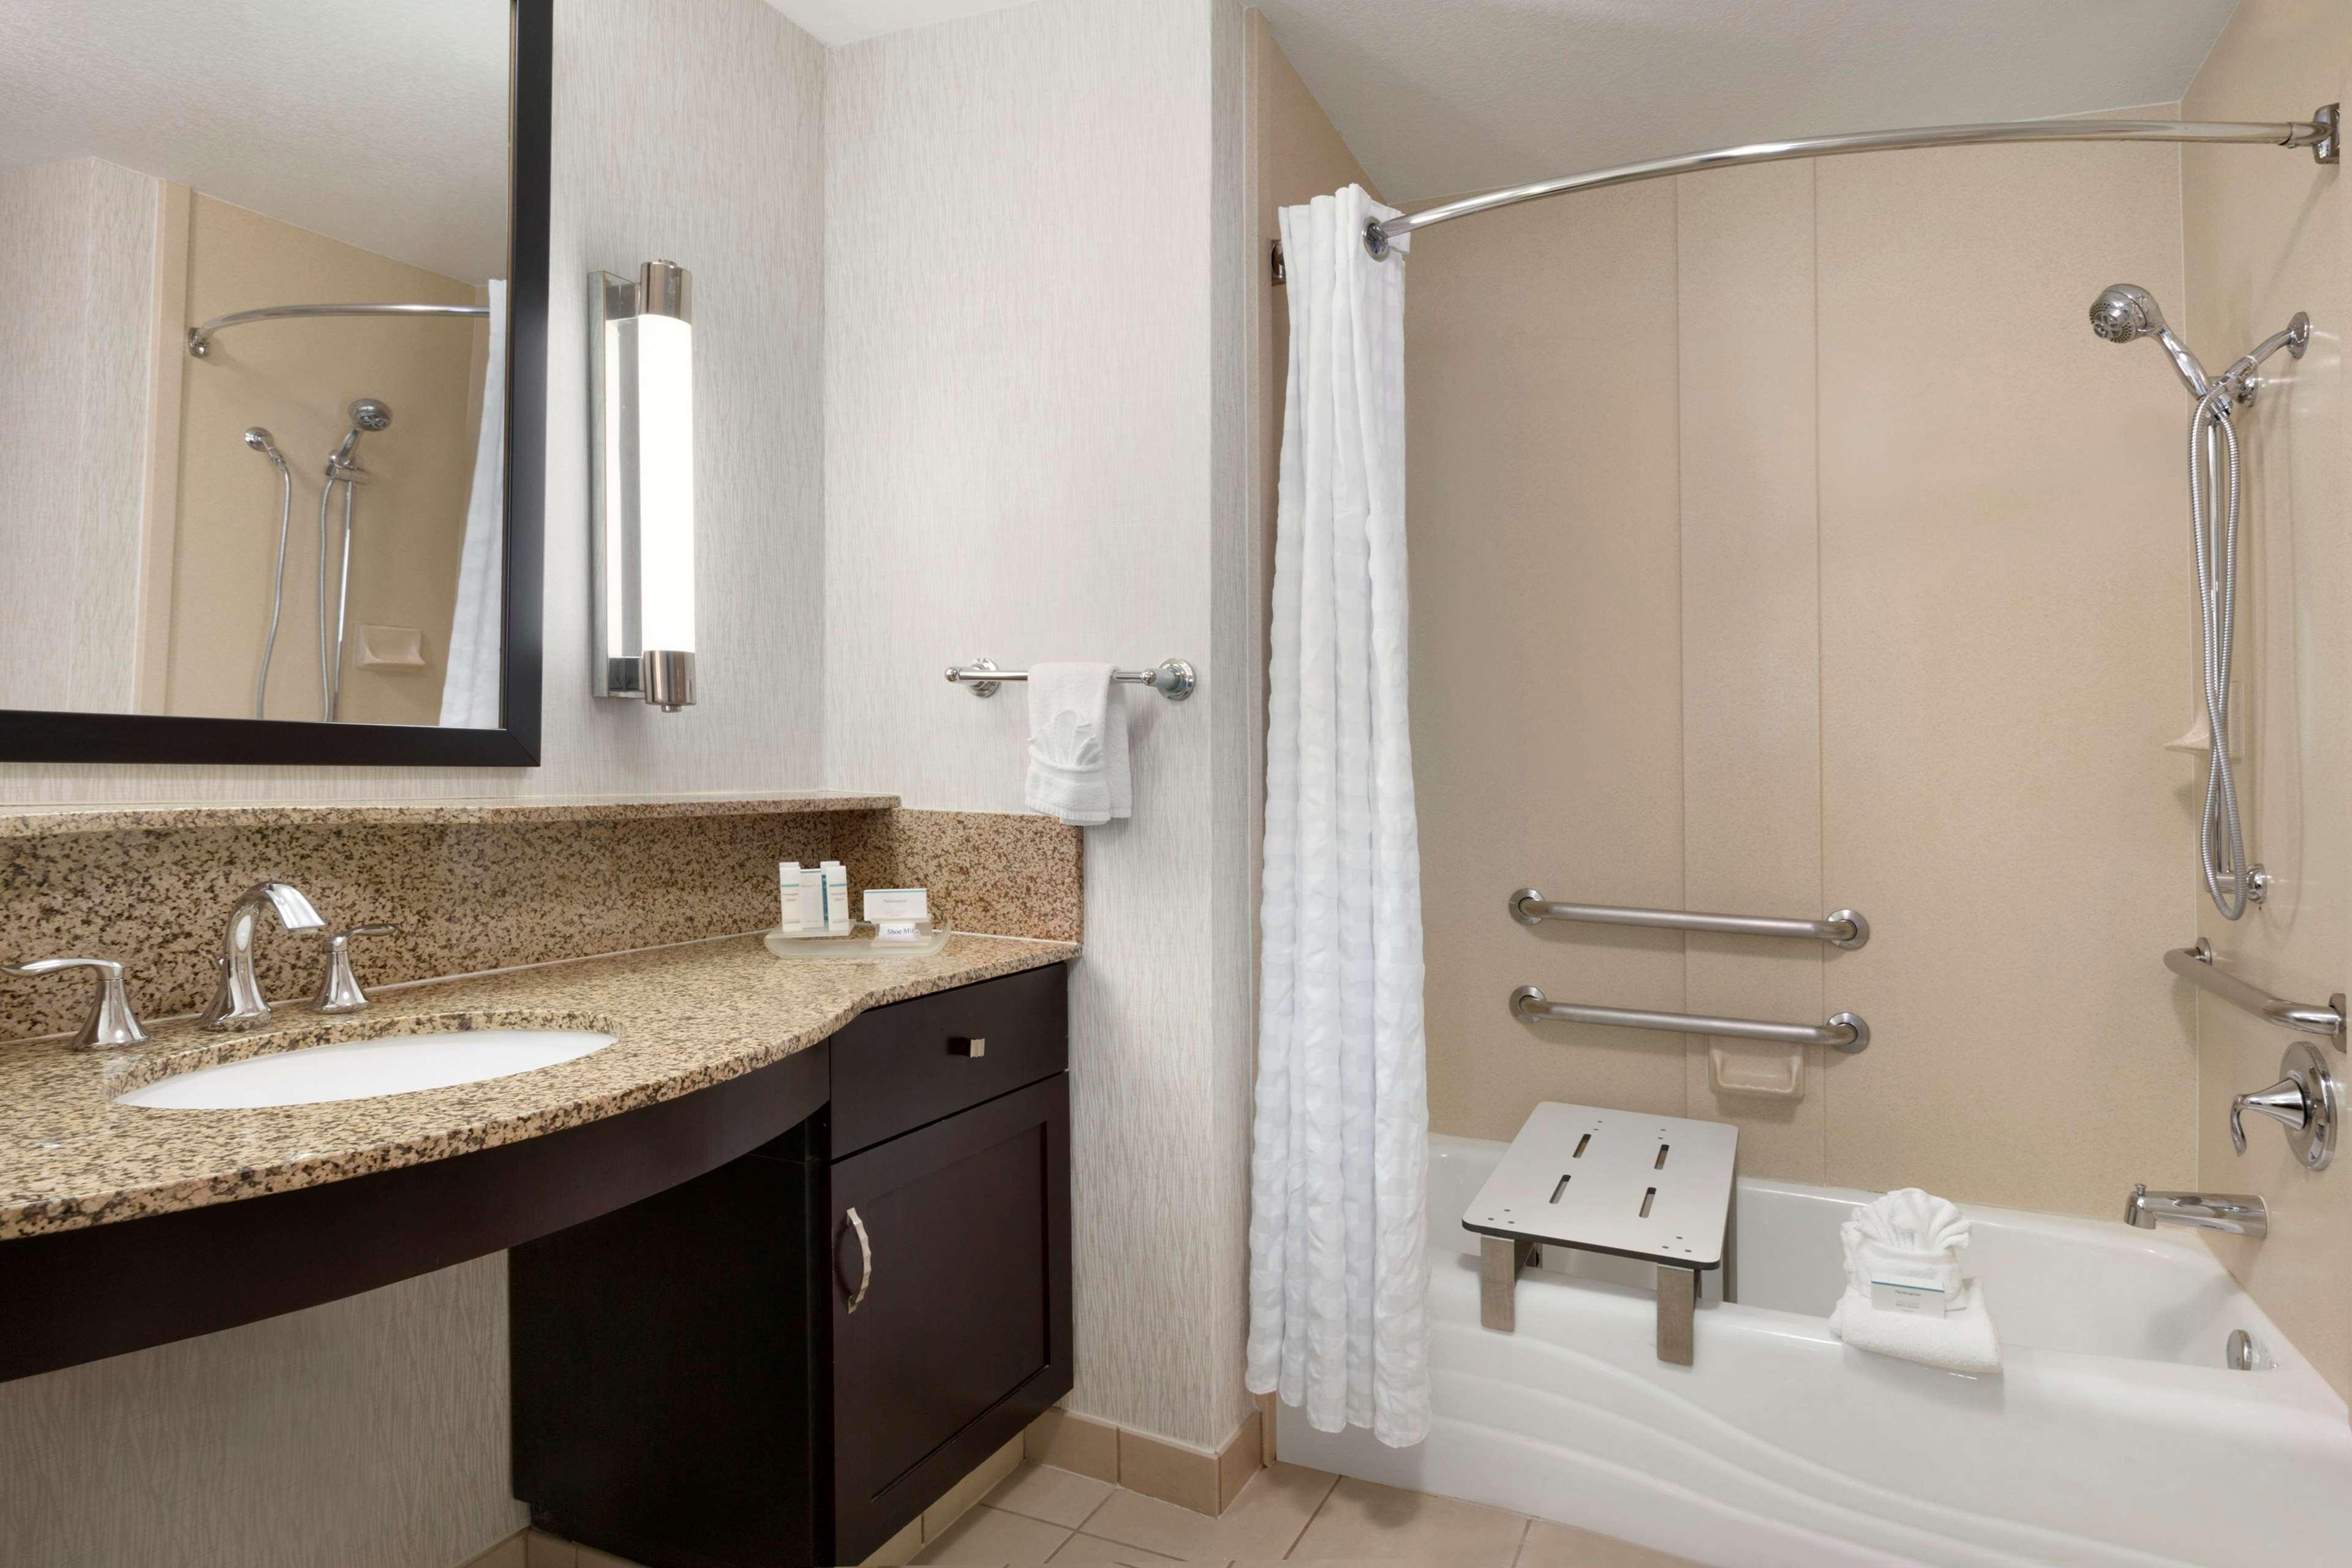 Homewood Suites by Hilton Plano-Richardson image 8